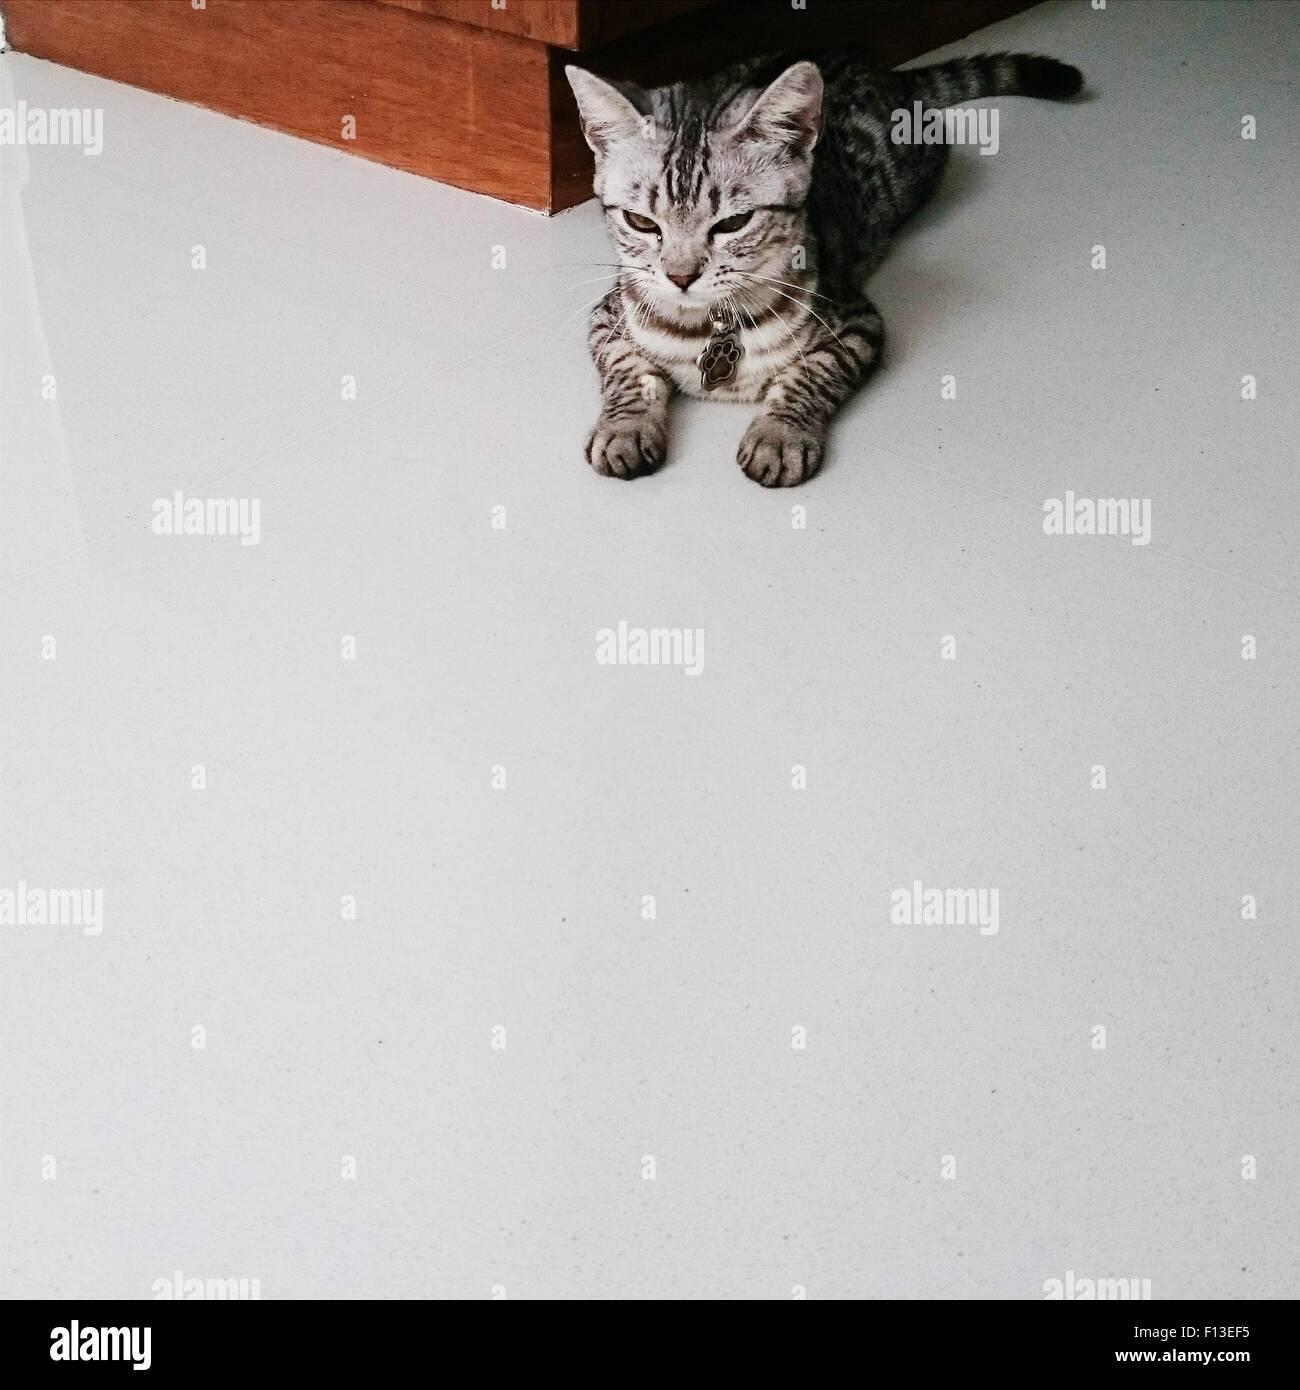 Portrait of a grumpy cat Stock Photo